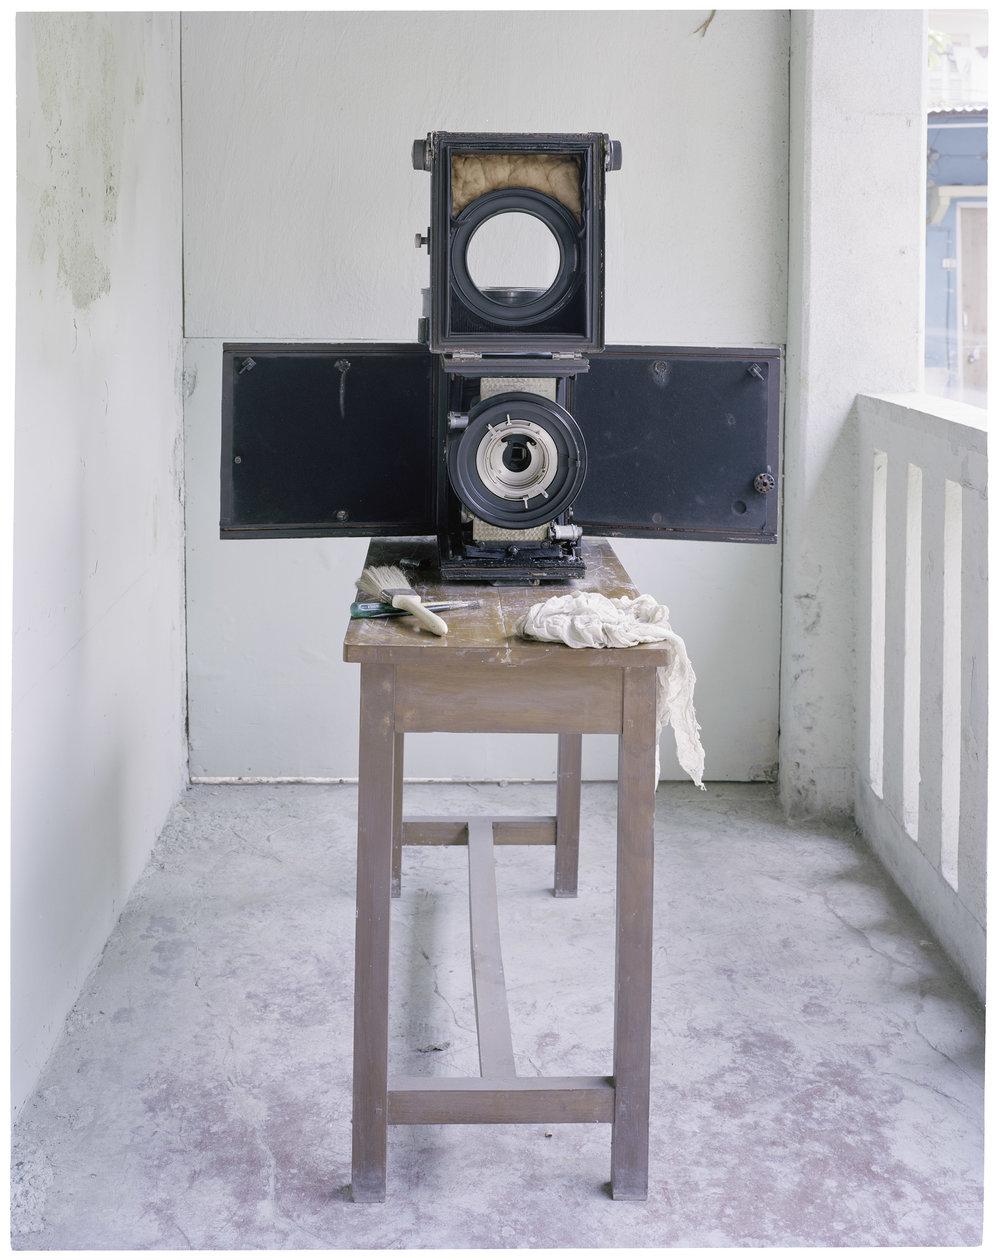 Andre Debrie Parvo camera (Silent Film era)- 10, 2013/14  from  Film Studio Series